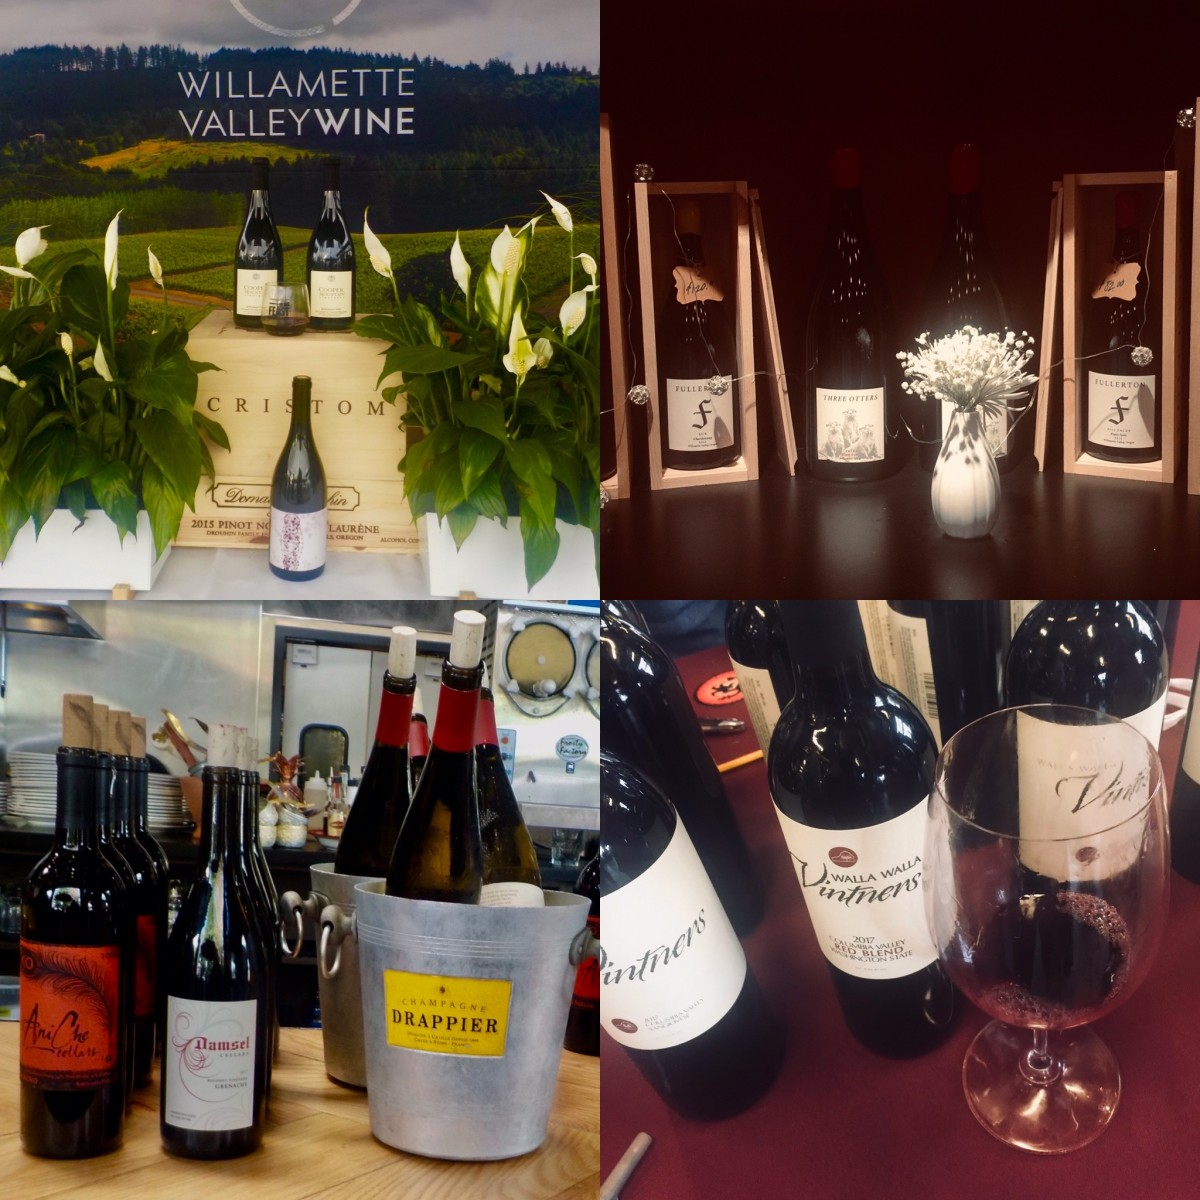 (L to R) Aniche Cellars and Damsel Cellars (Feast Portland 2019), Willamette Valley Wineries Association, Fullerton Wines, Walla Walla Wine Portland Grand Tasting 2020)